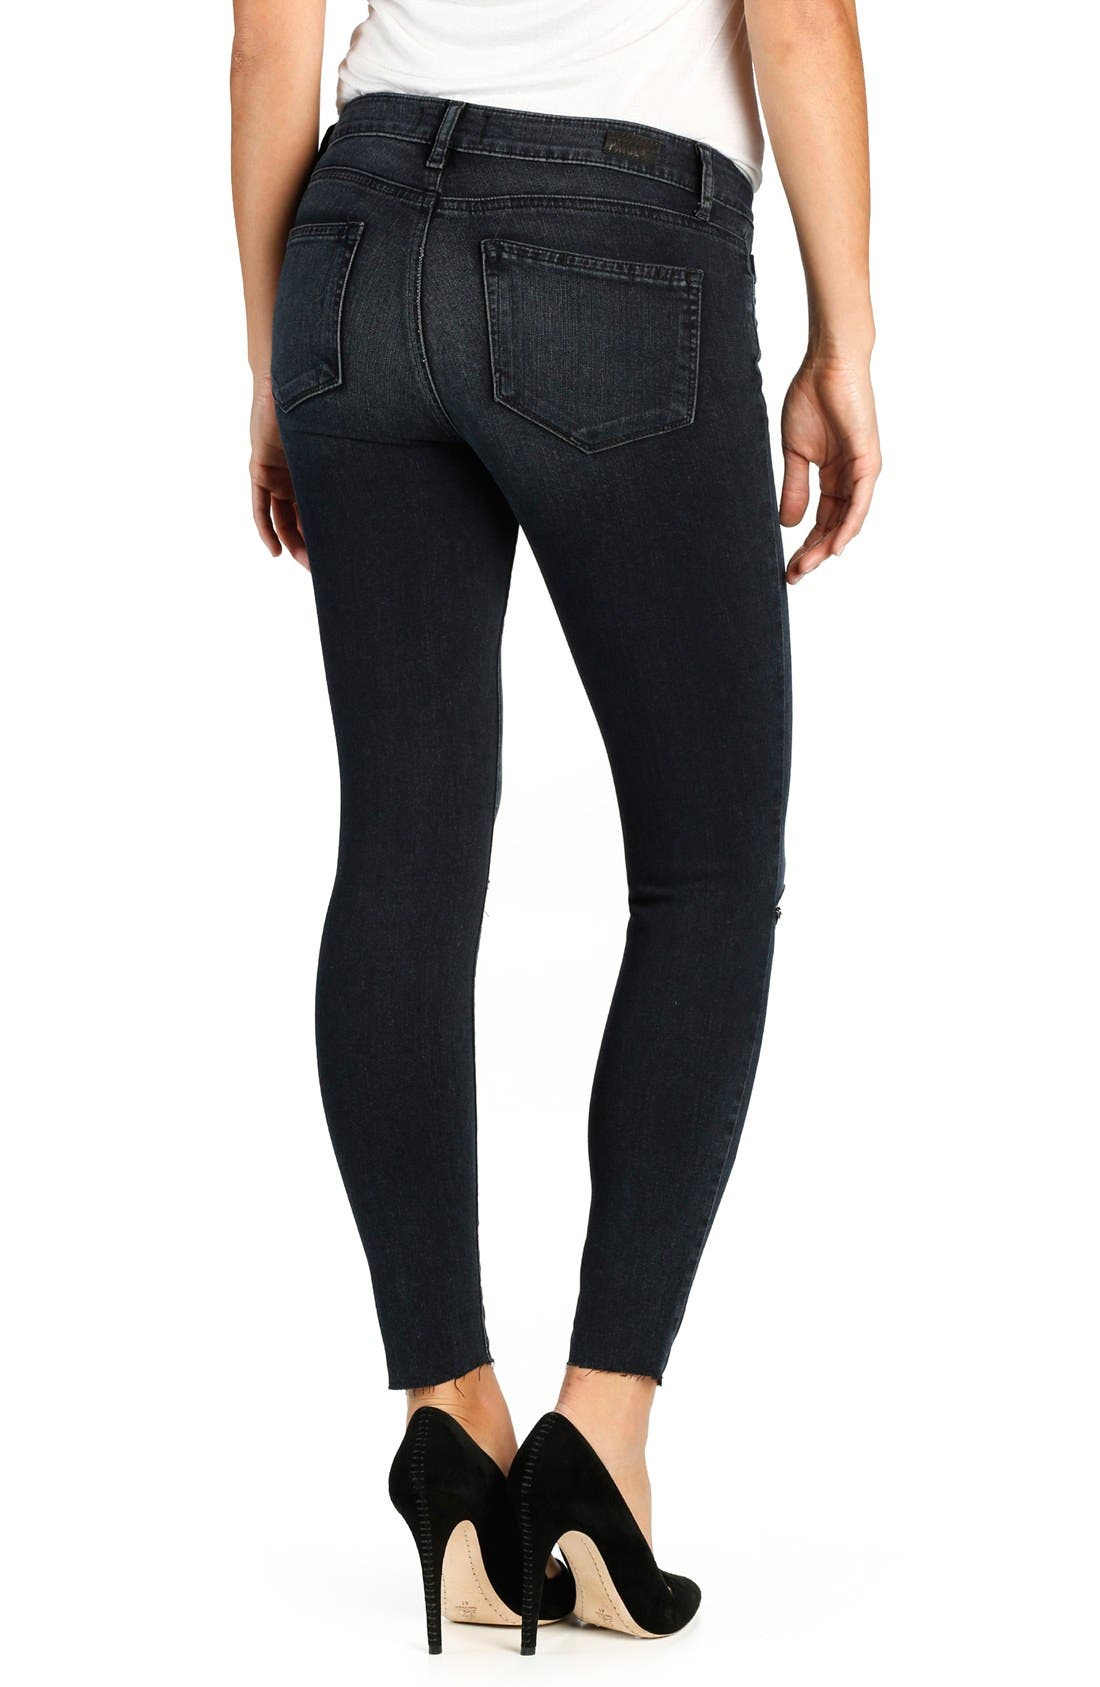 Alternate Image 2  - PAIGE Transcend Verdugo Ripped Ankle Ultra Skinny Jeans (Kaleea Destructed)